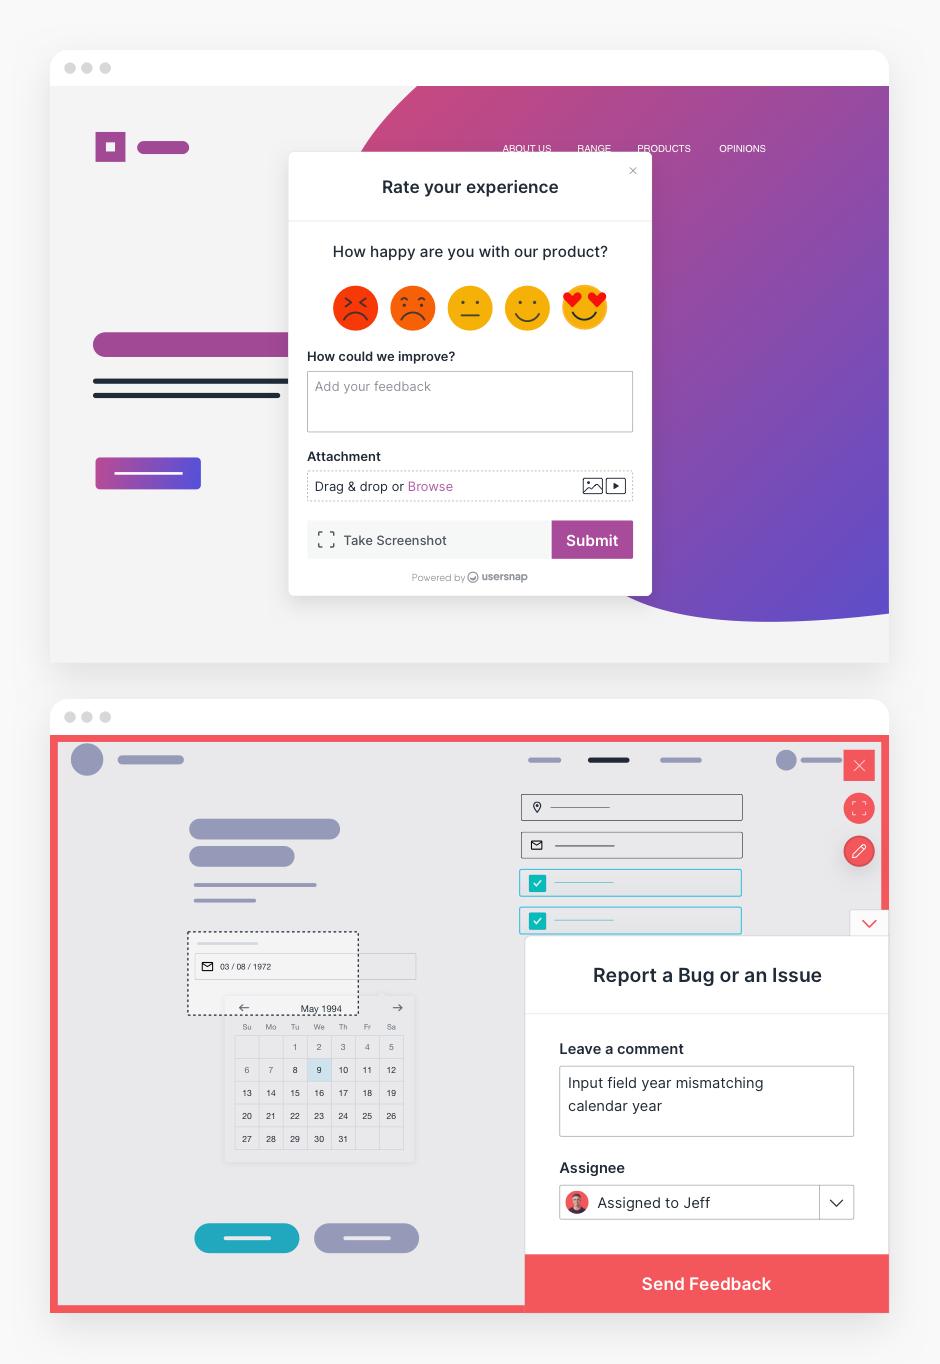 Examples of various customer feedback surveys